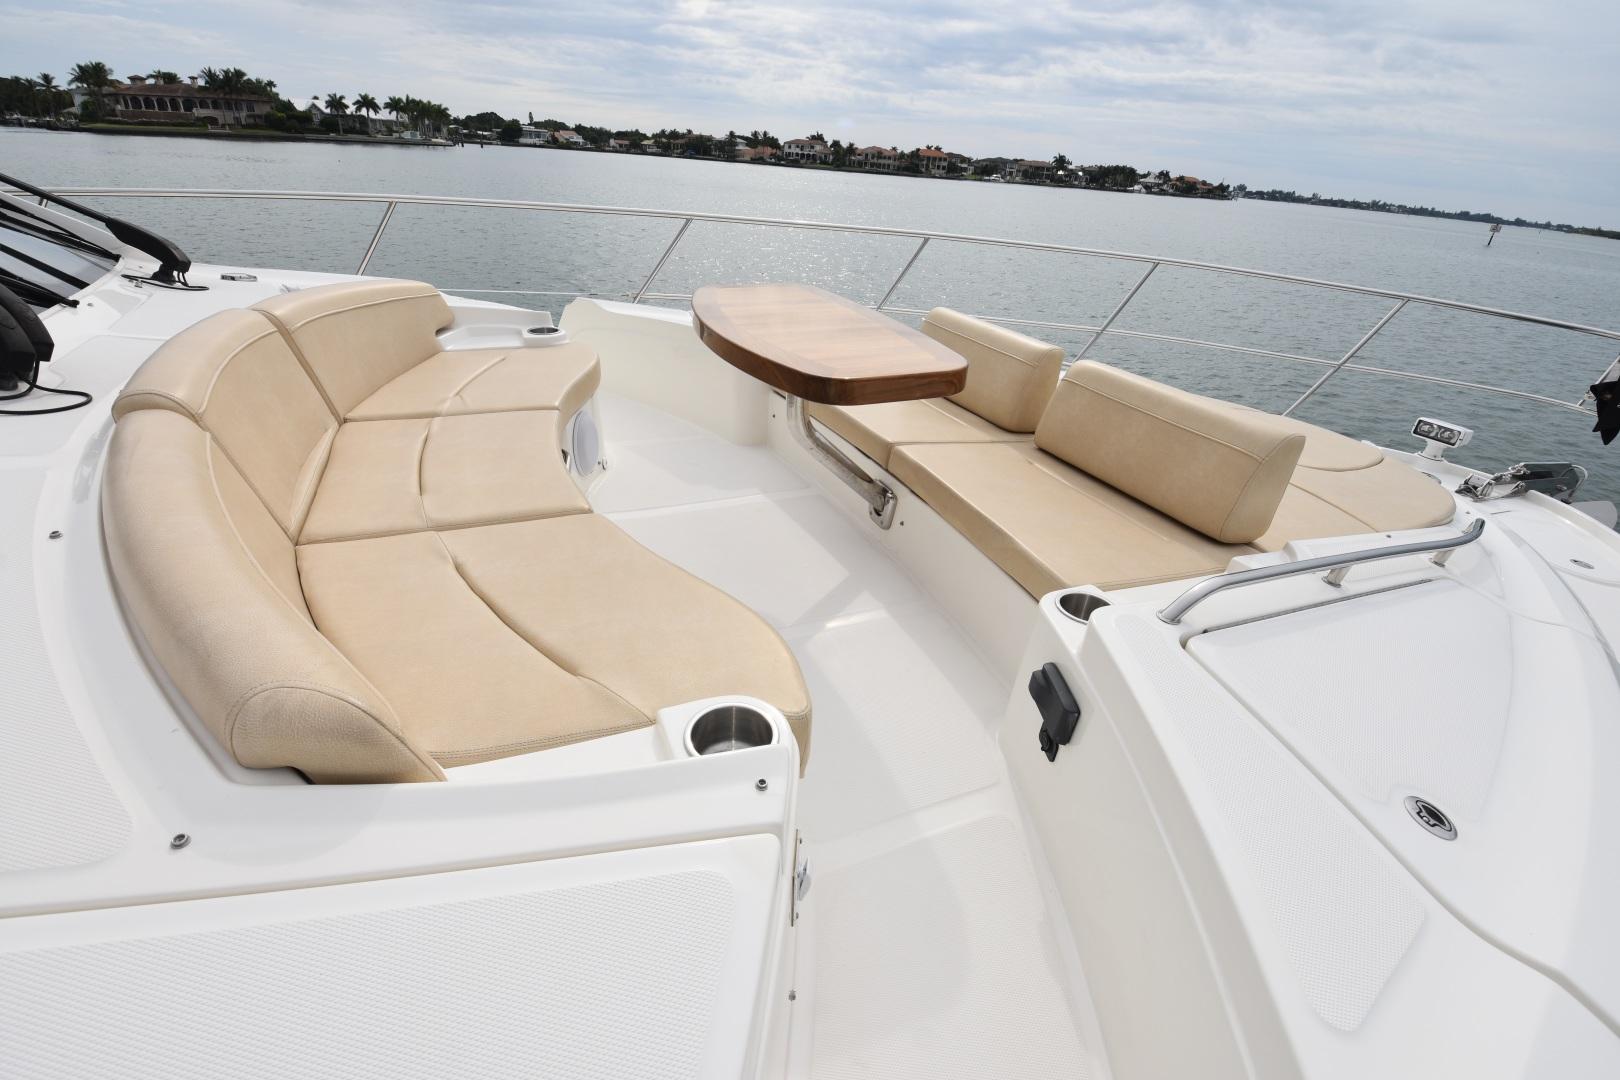 Sea Ray-L650 2016-3x's the Charm Longboat Key-Florida-United States-2016 Sea Ray L650  3x's the Charm  Bow Seating-1251860 | Thumbnail